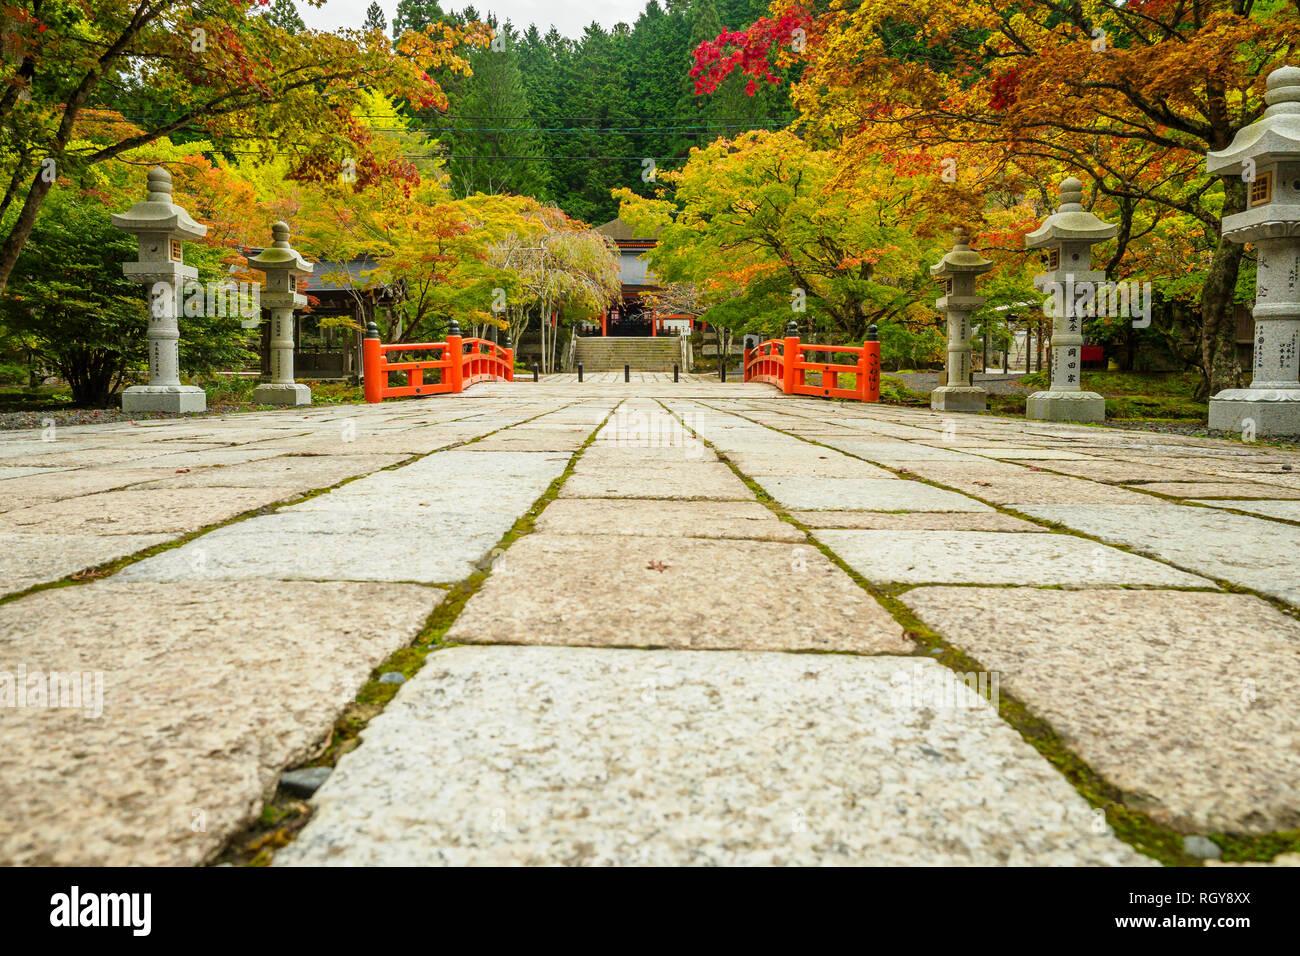 Eireiden-Tempel mit Friedhofs-Bereich bei Koyasan (Mt Koya) in Wakayama, Japan - Stock Image